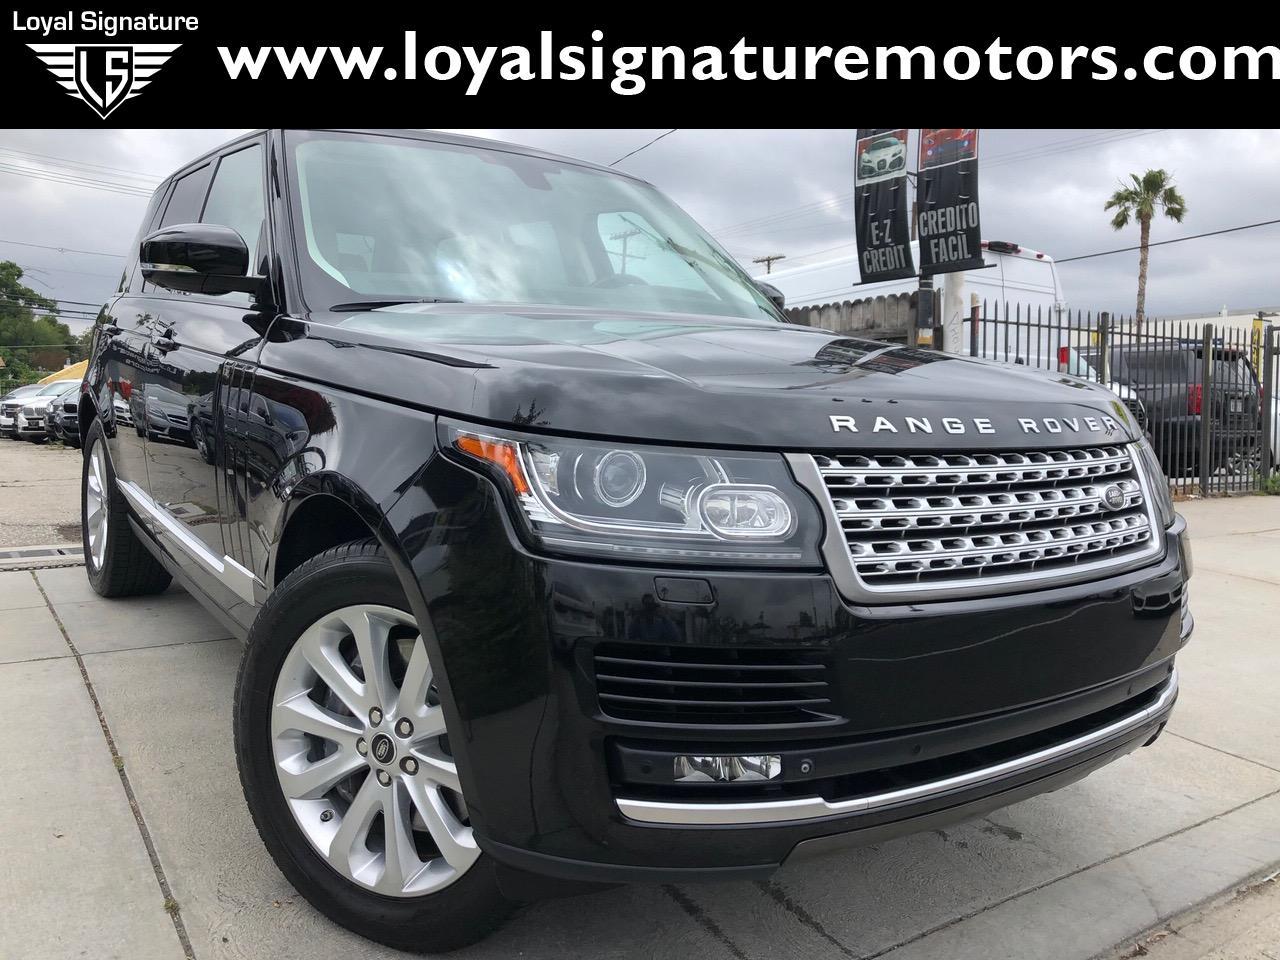 Used 2013 Land Rover Range Rover HSE | Van Nuys, CA